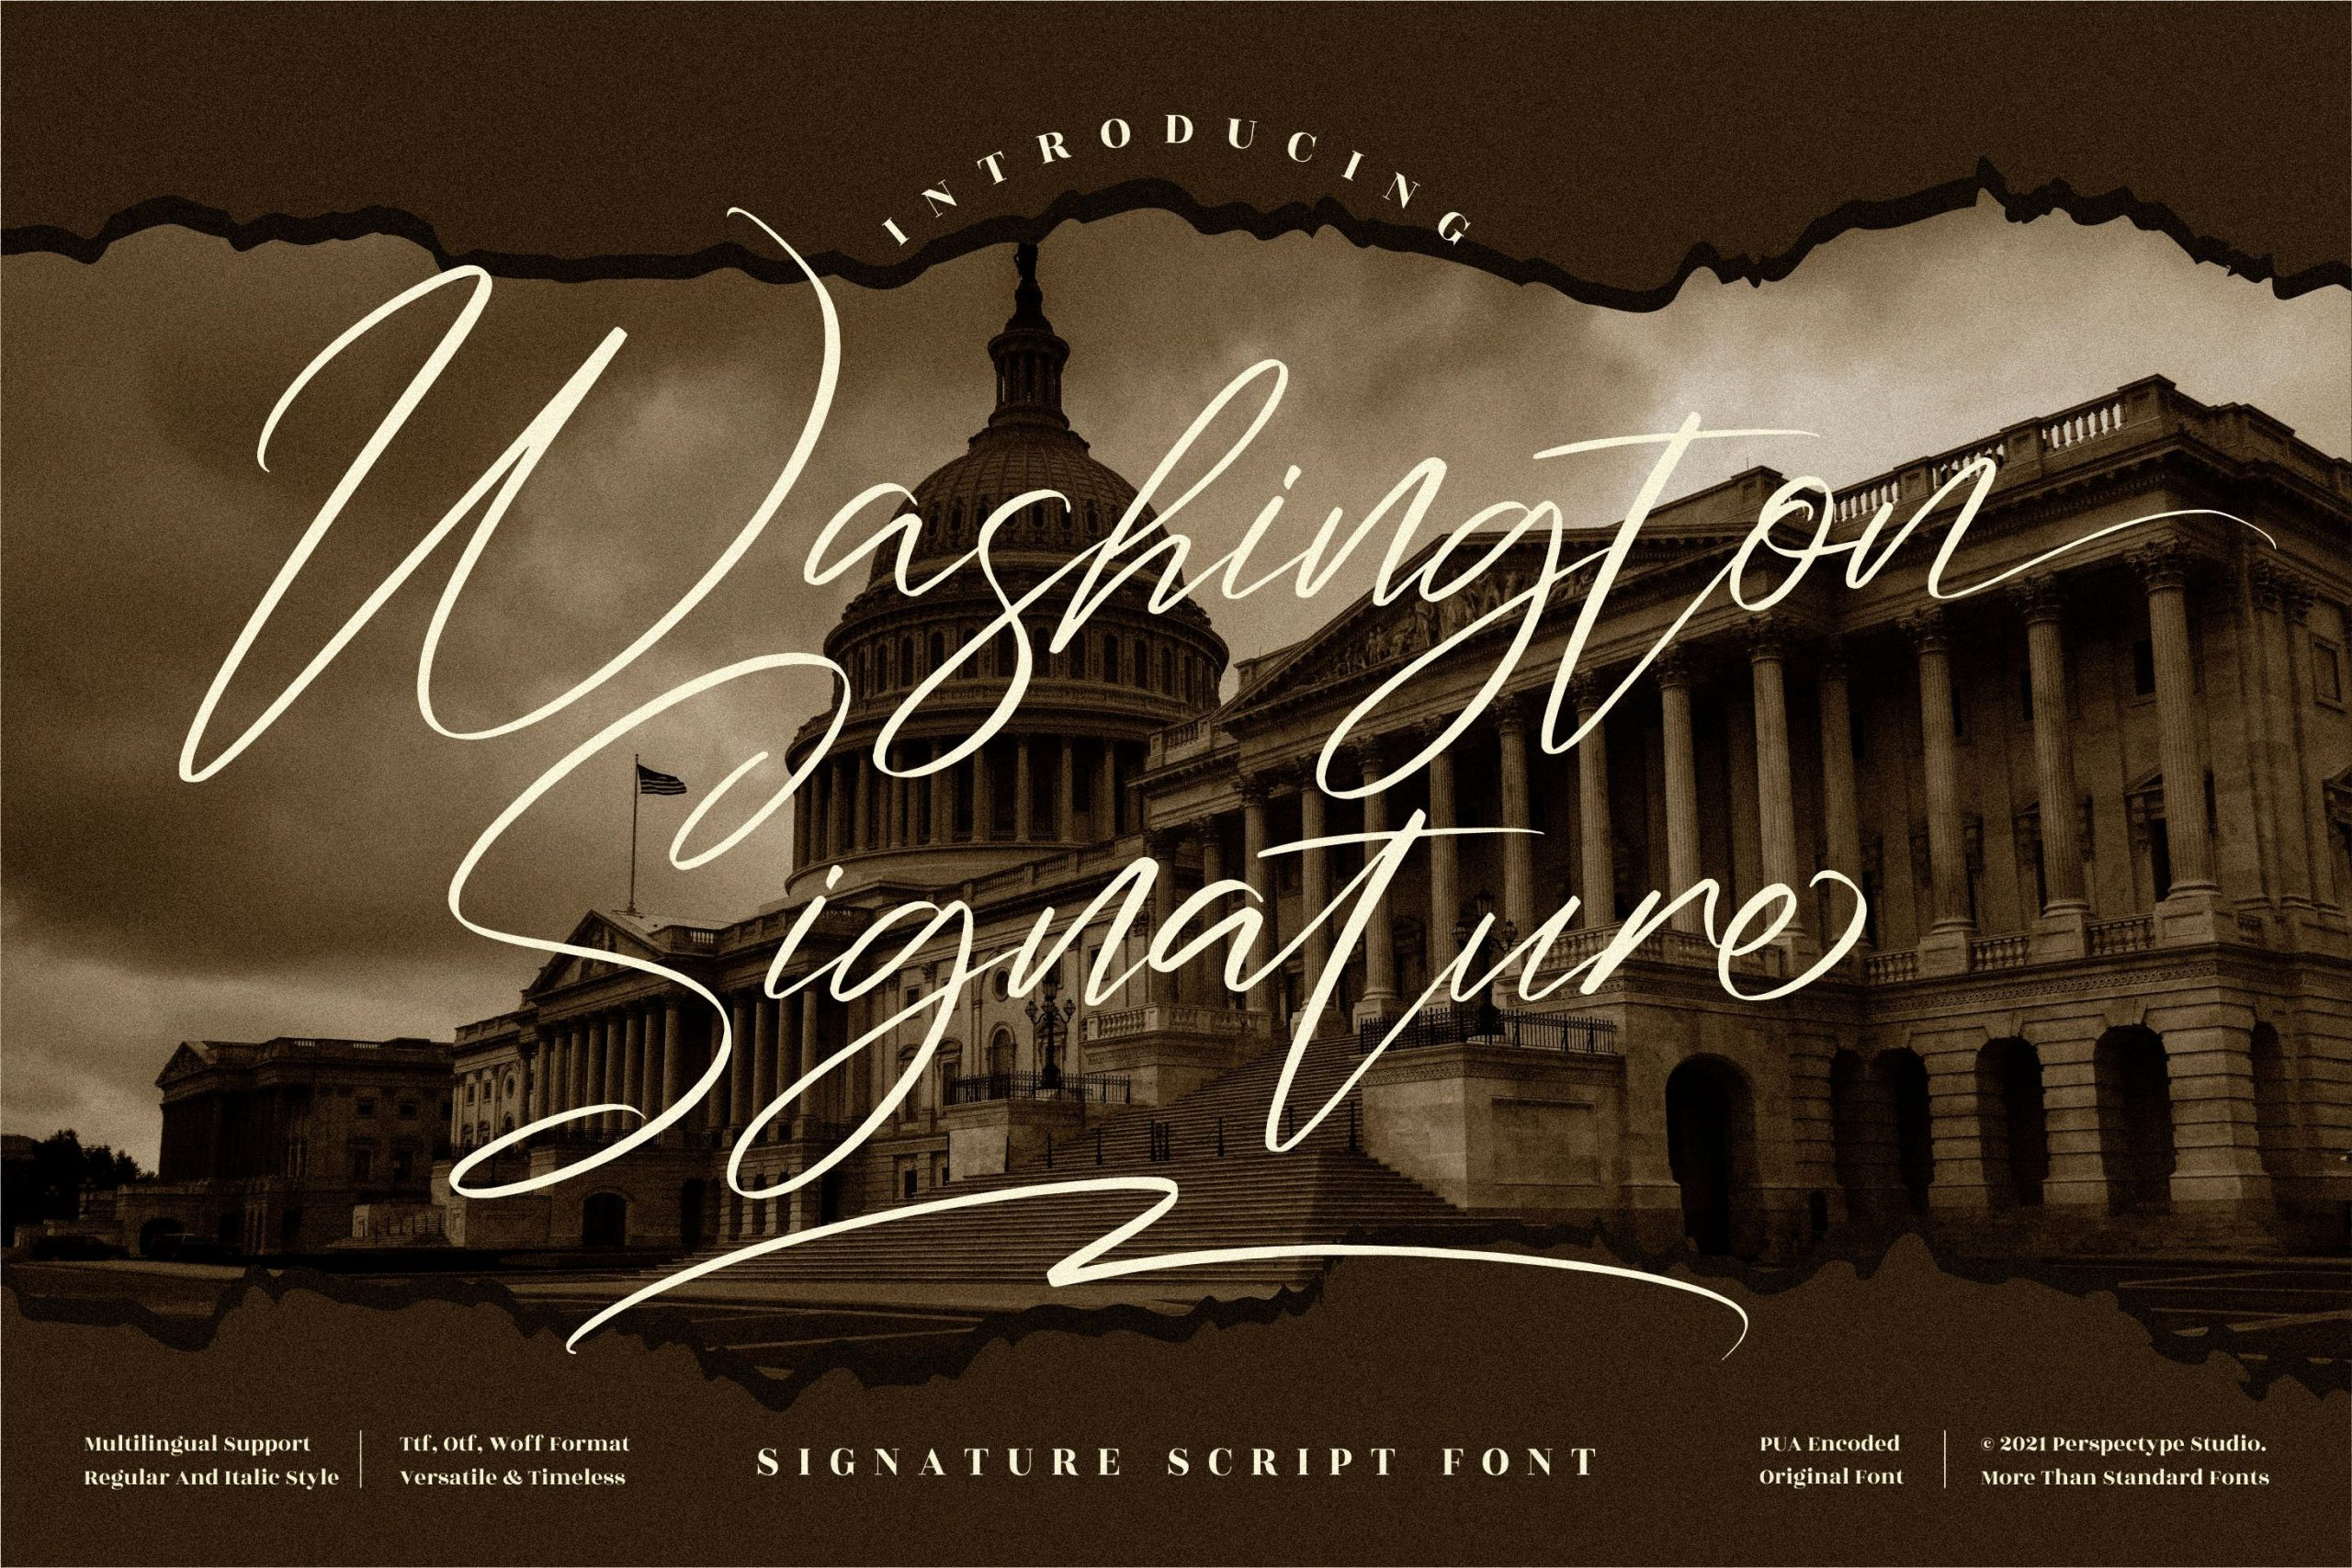 Washington Signature Script Font -1